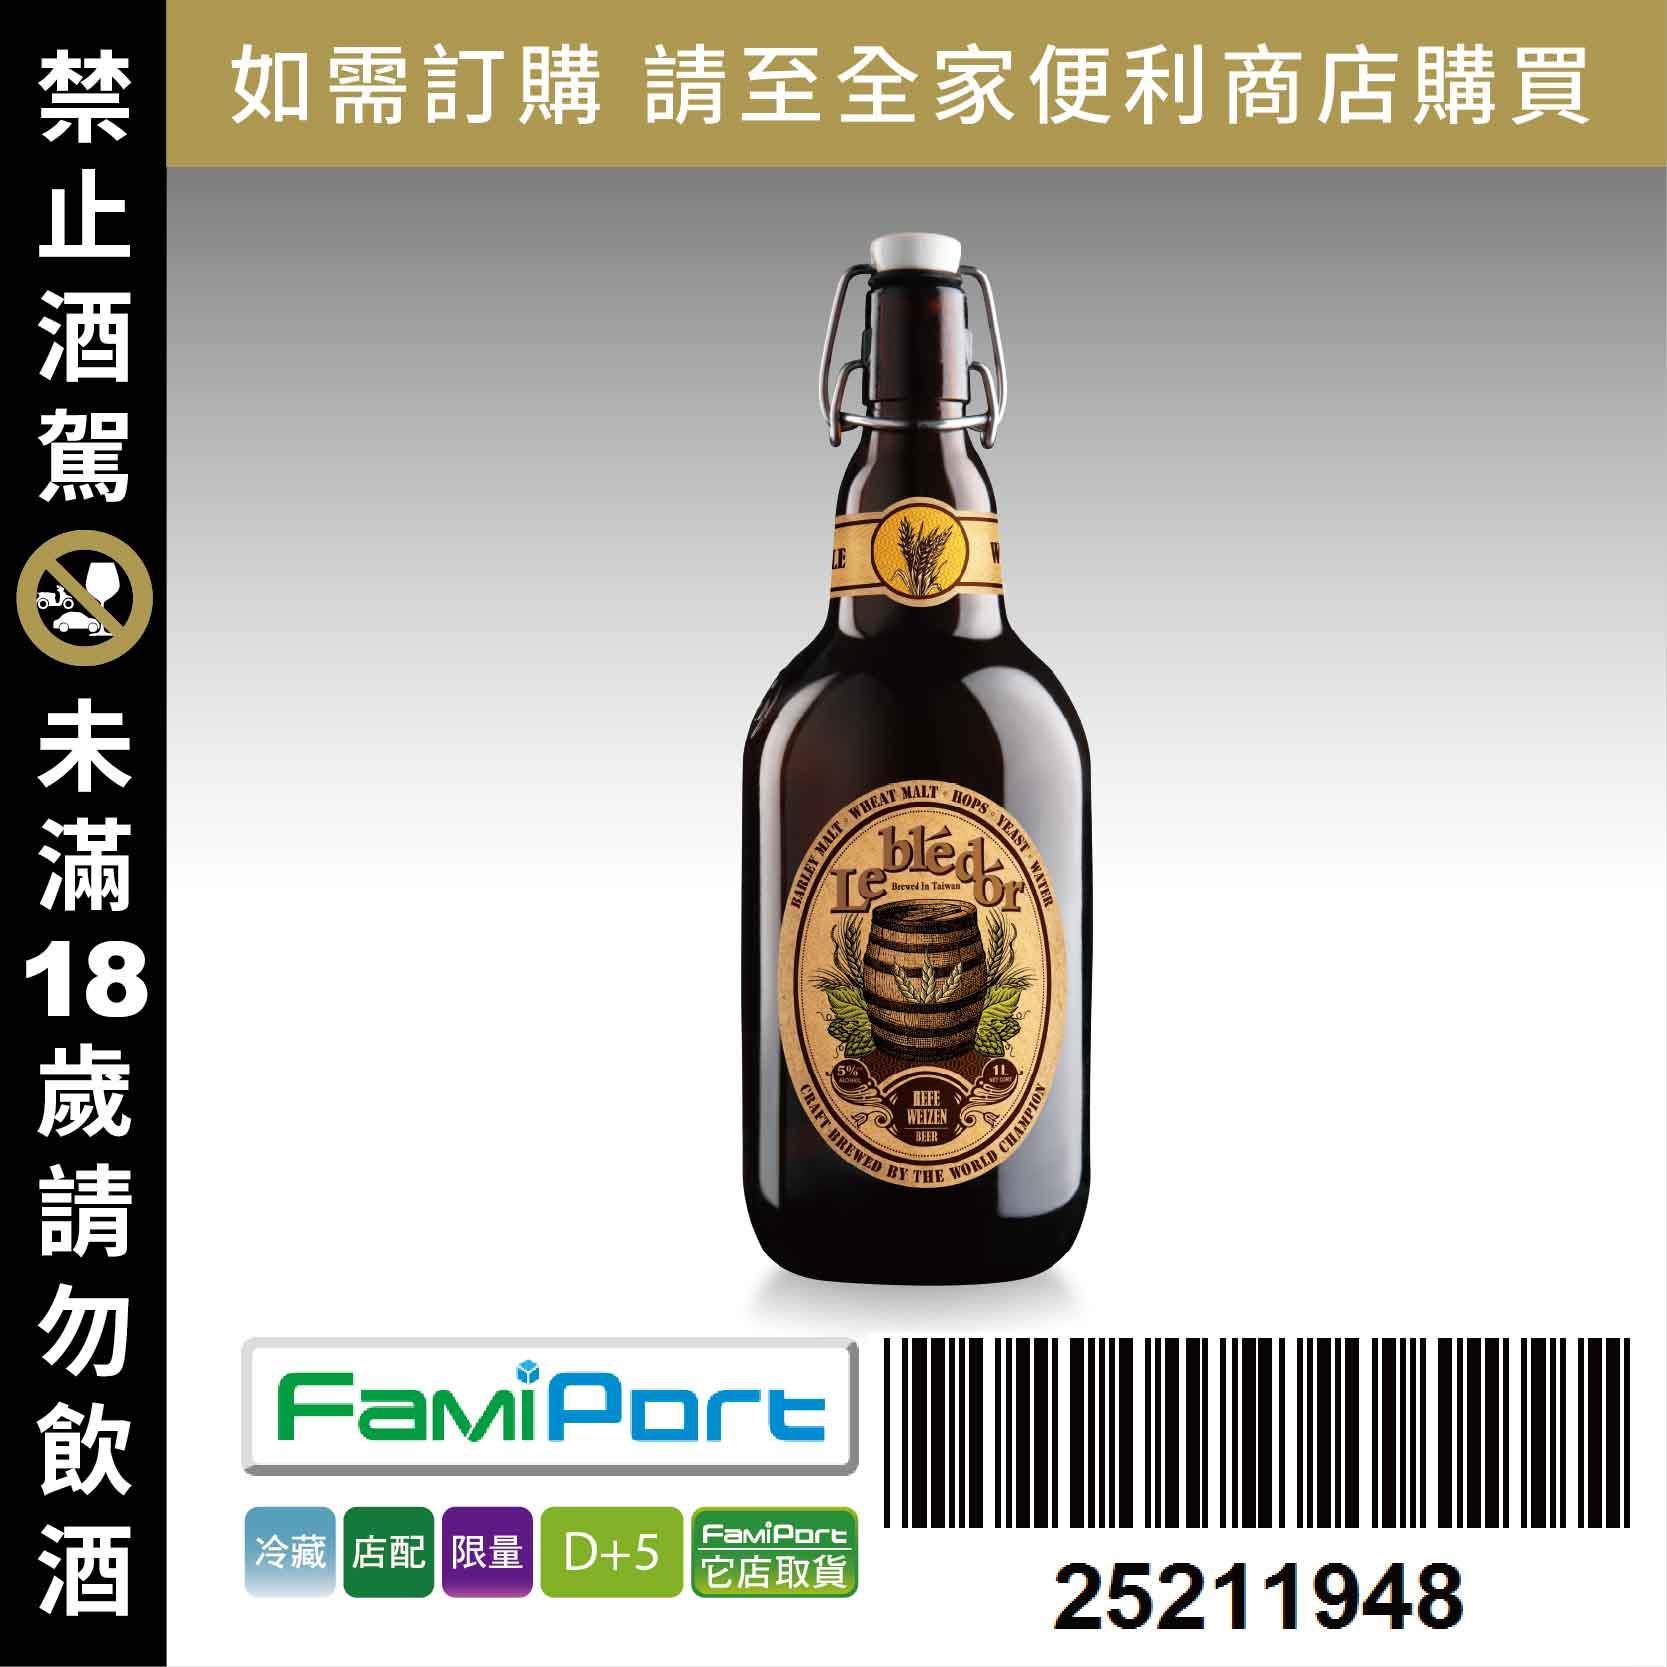 【FamiPort訂購】金色三麥小麥啤酒1L/入